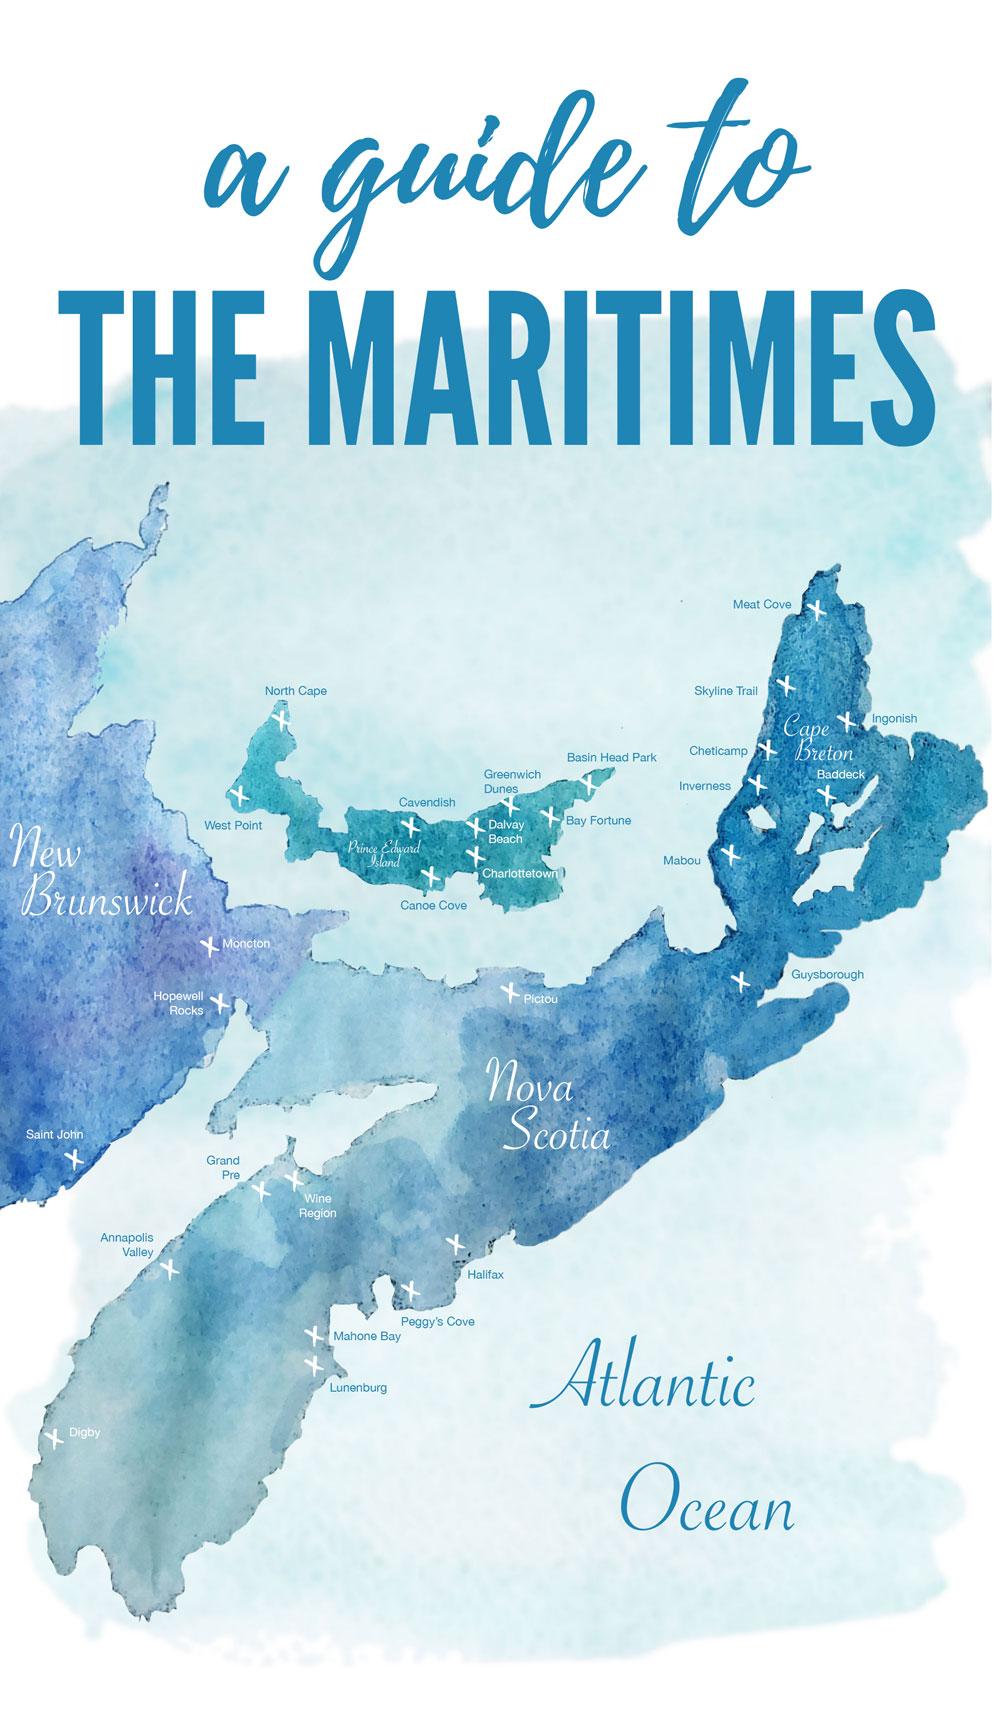 Maritimes travel guide